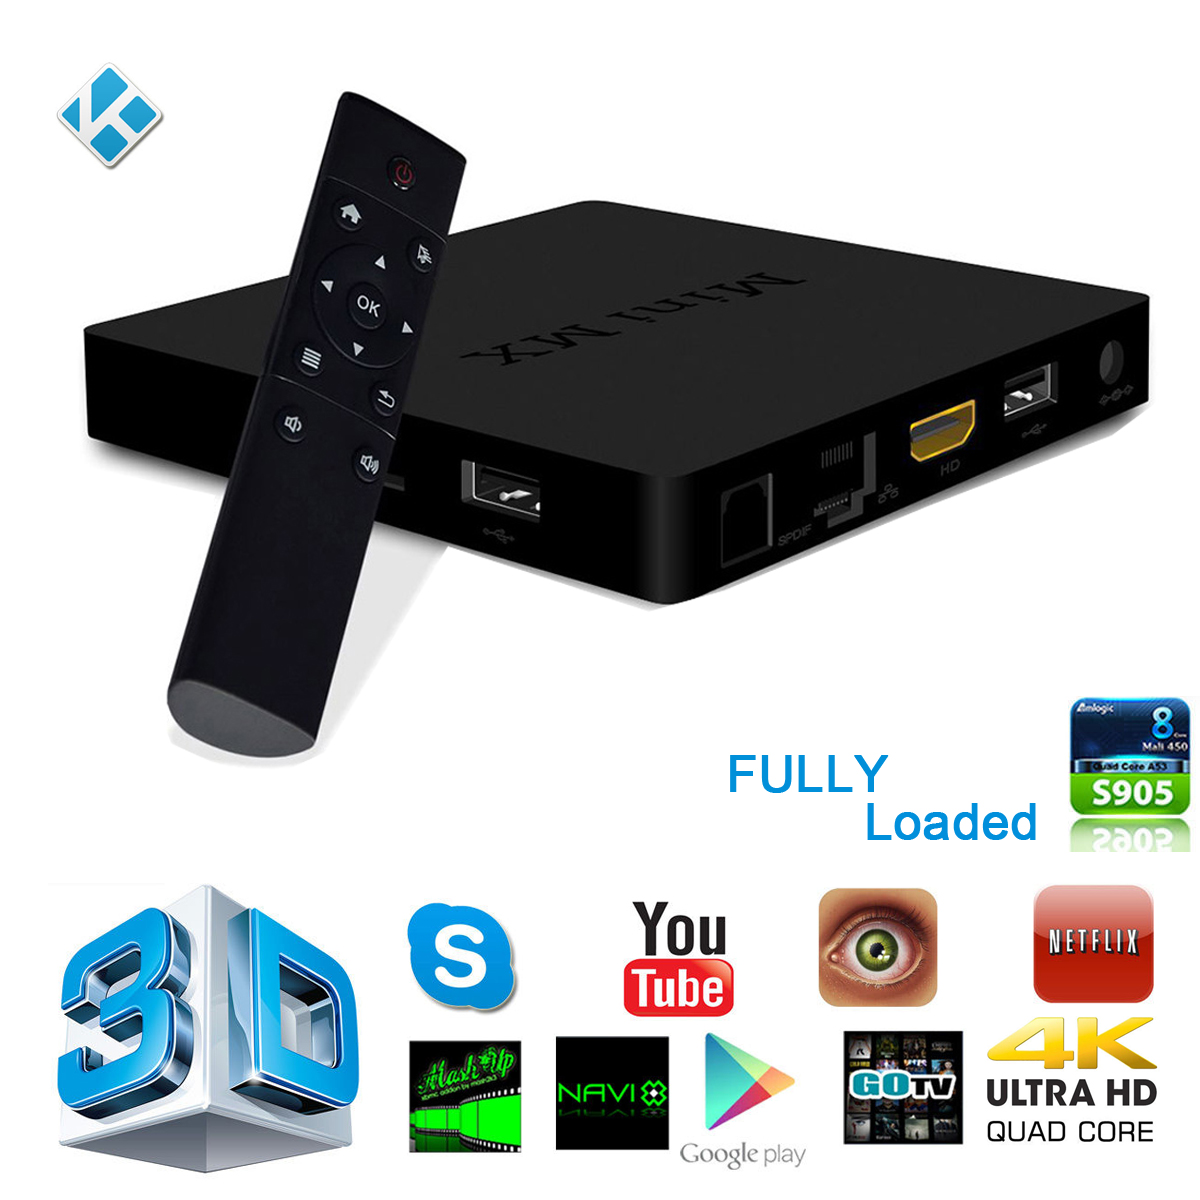 Mini MX Amlogic S905 KODI Android 5.1 TV Box 1GB/8GB Lan Wifi Bluetooth 4.0 Quad Core Fully Loaded XBMC Media Player UK AH108(China (Mainland))